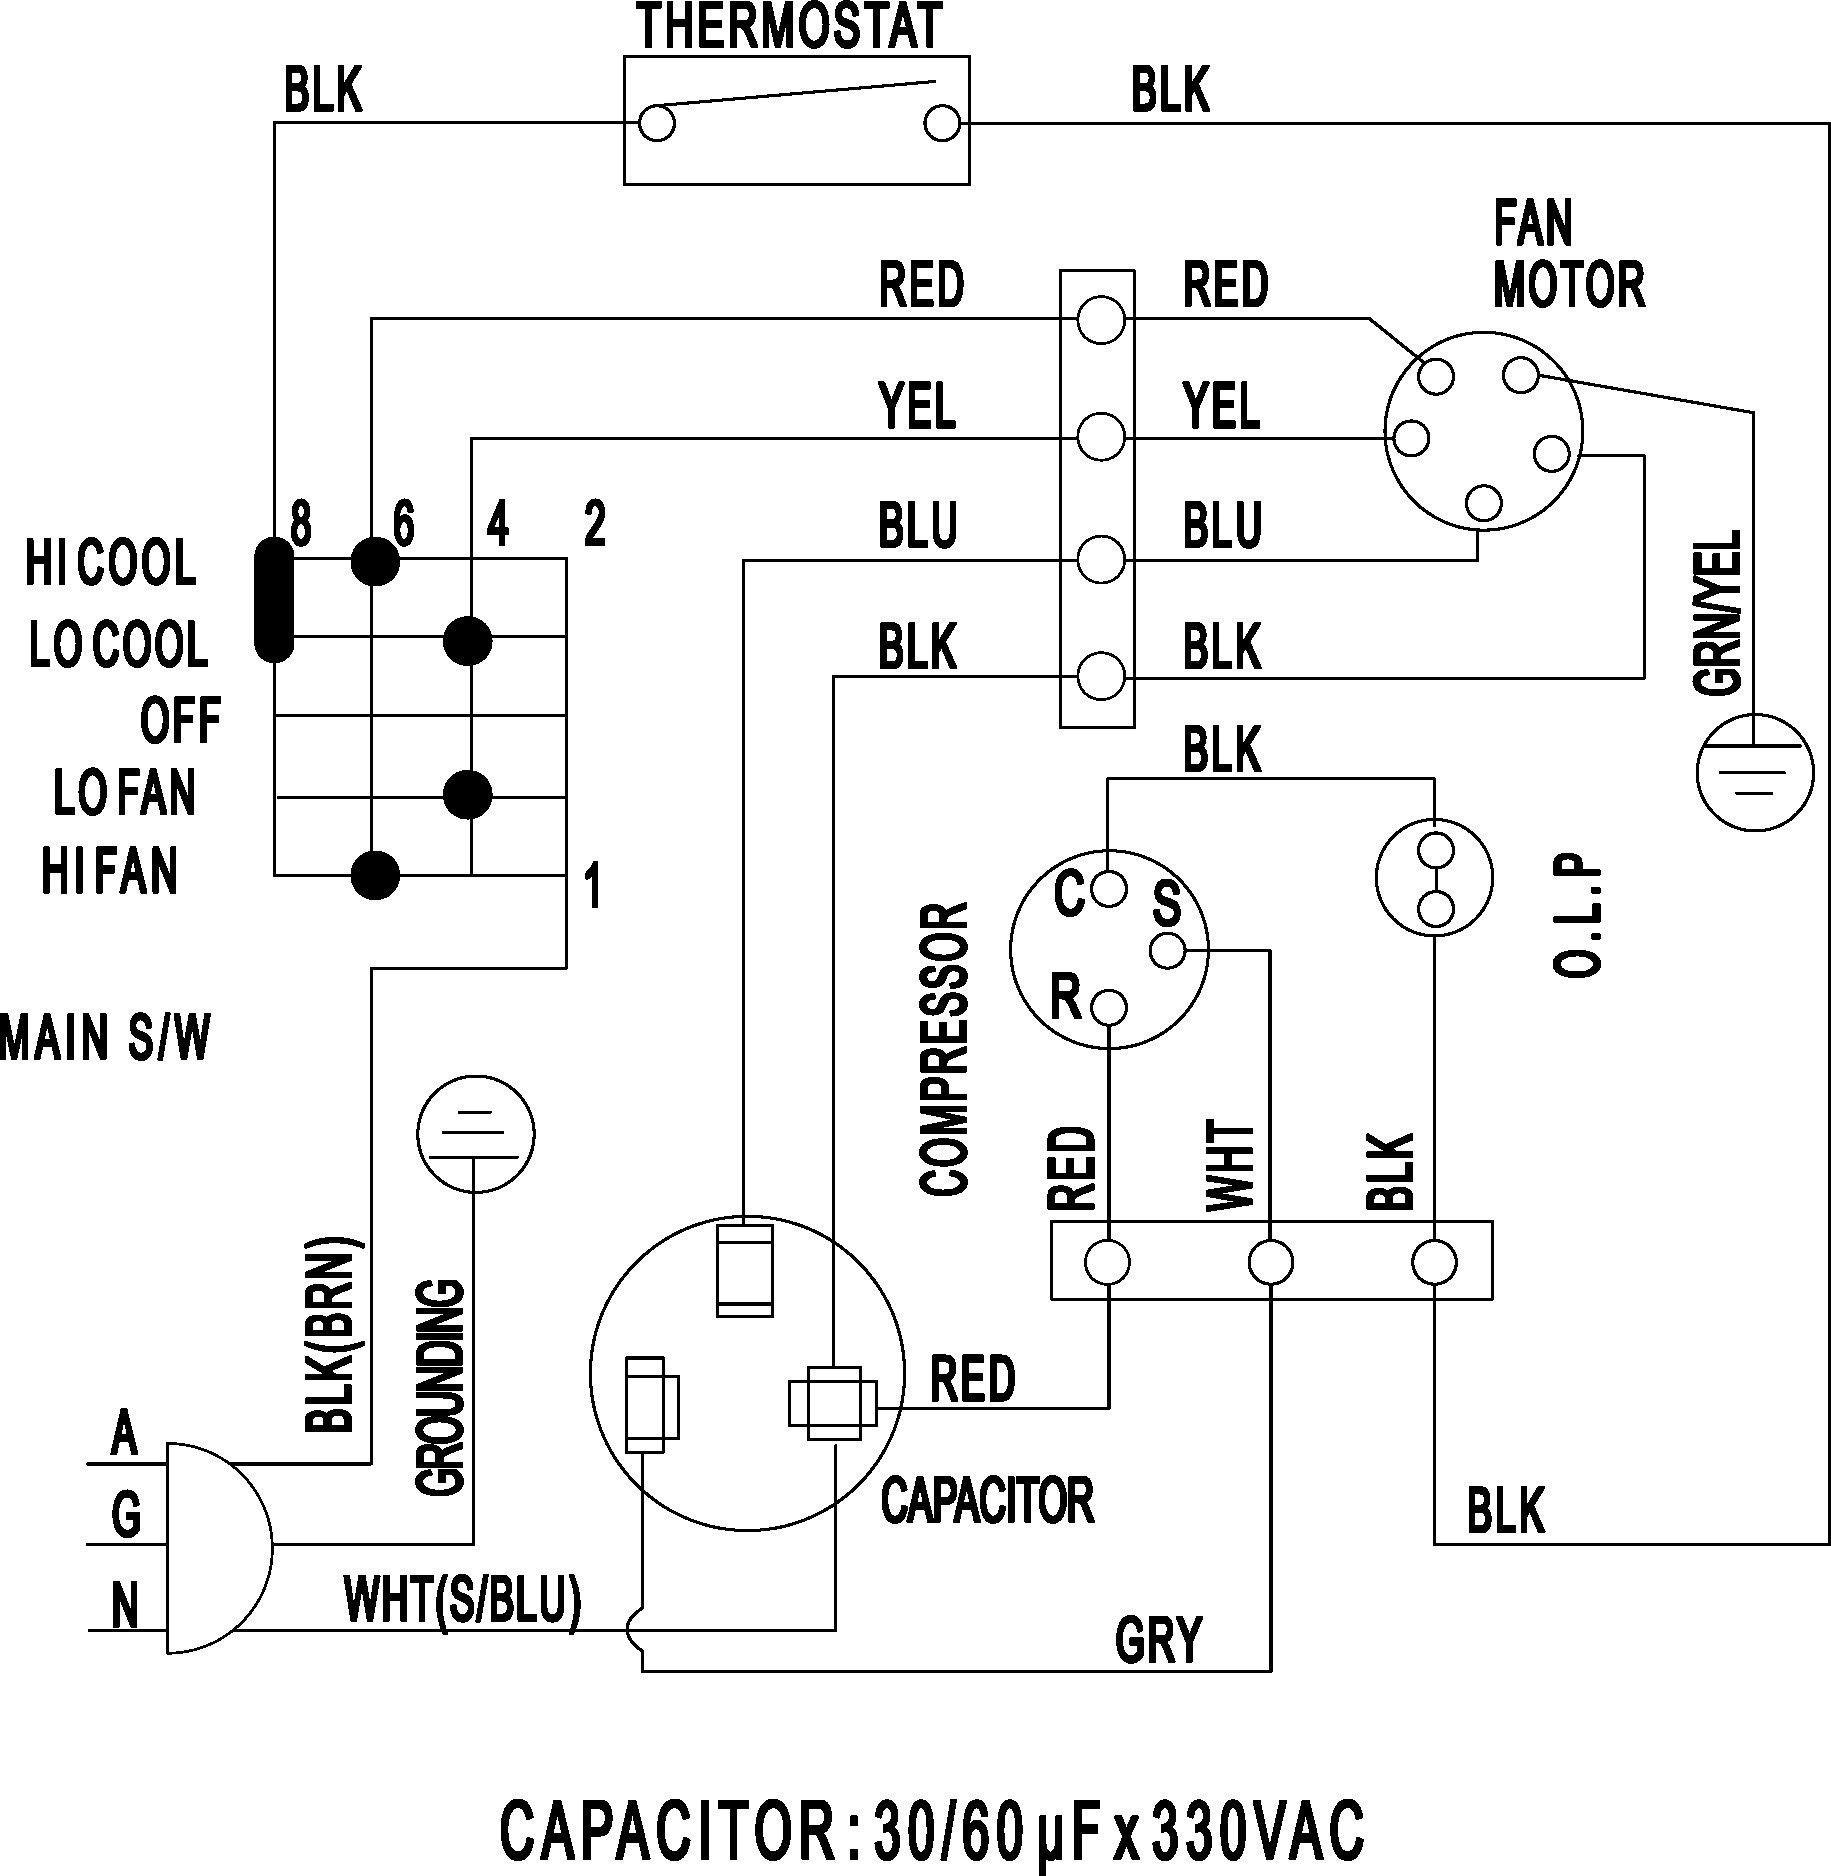 Split Ac Wiring Diagram Pdf | 2019 Ebook Library - Ac Wiring Diagram Pdf